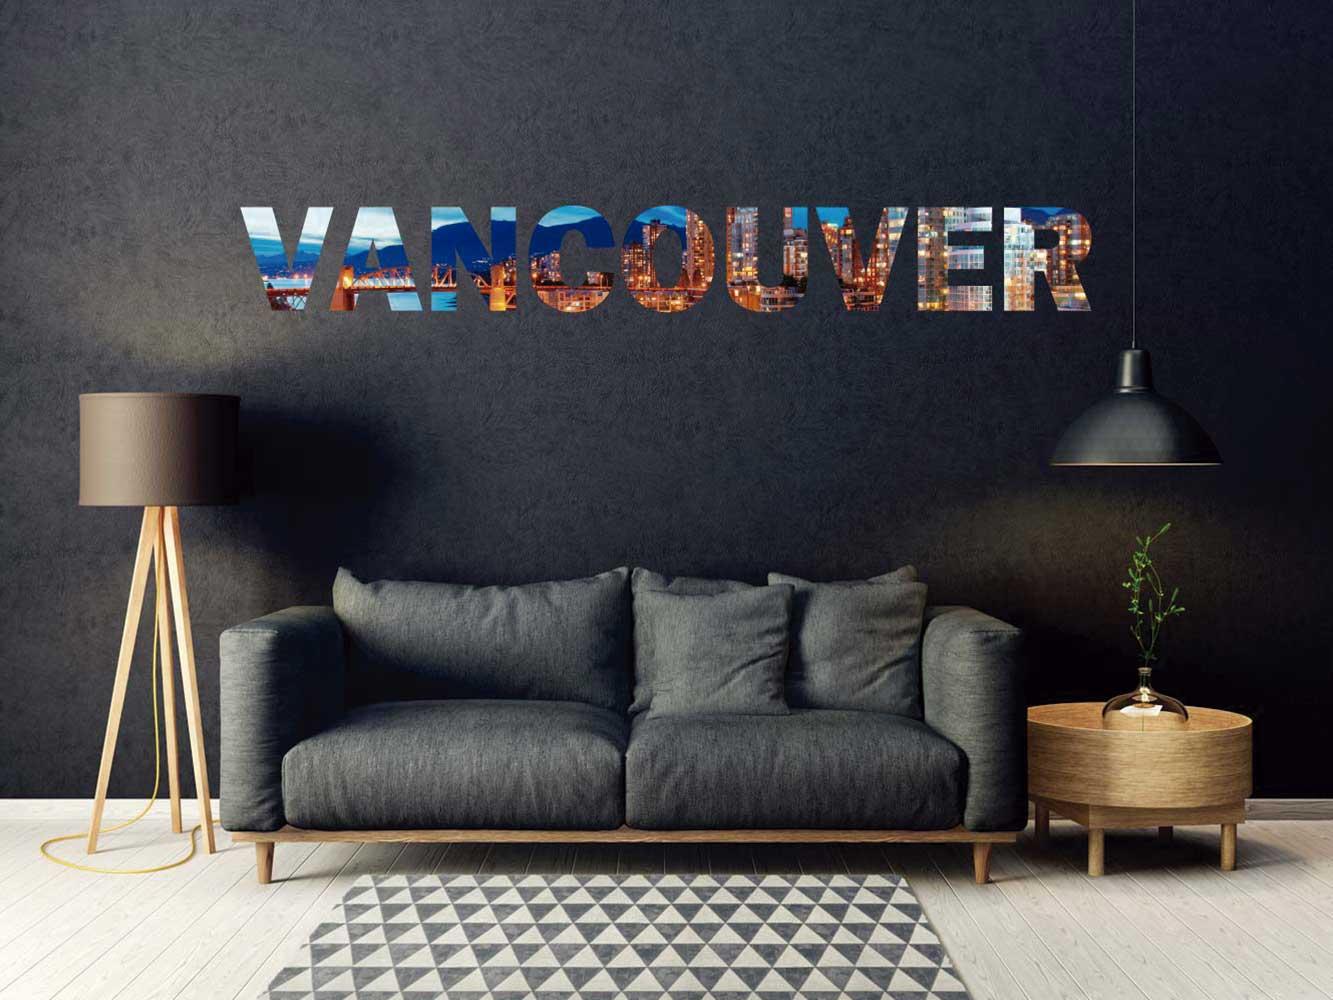 Vinilo Decorativo Ciudades Vancouver | Carteles XXL - Impresión carteleria publicitaria